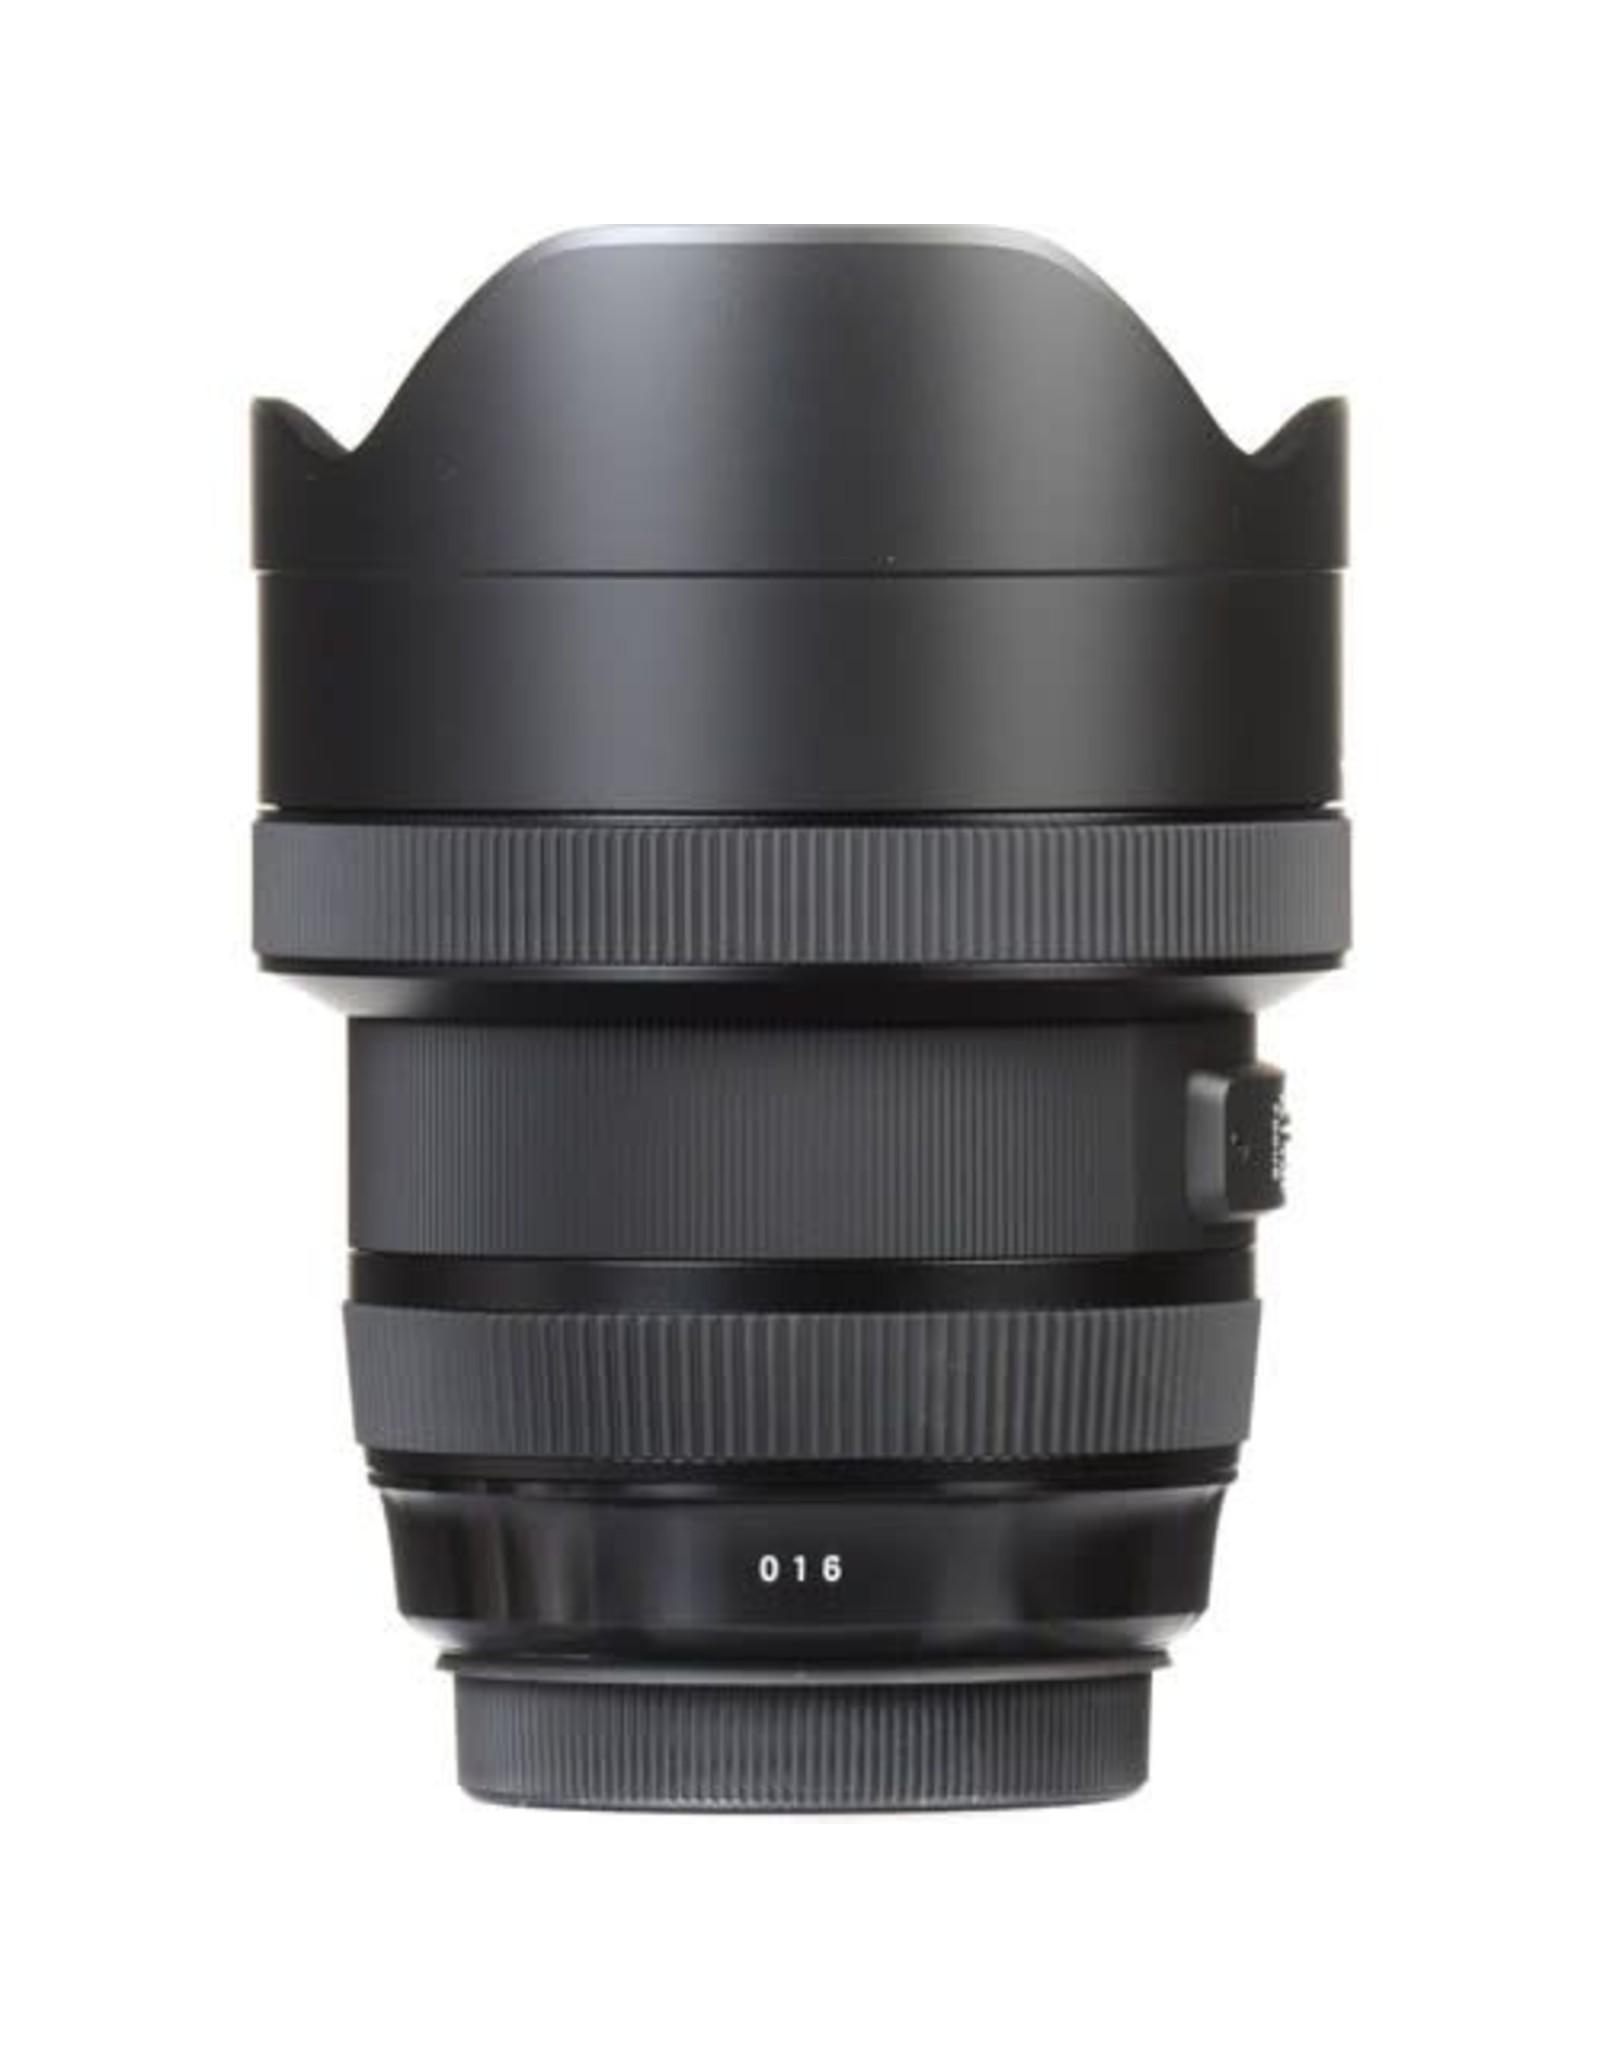 Sigma Sigma 12-24mm F4.0 Art DG HSM